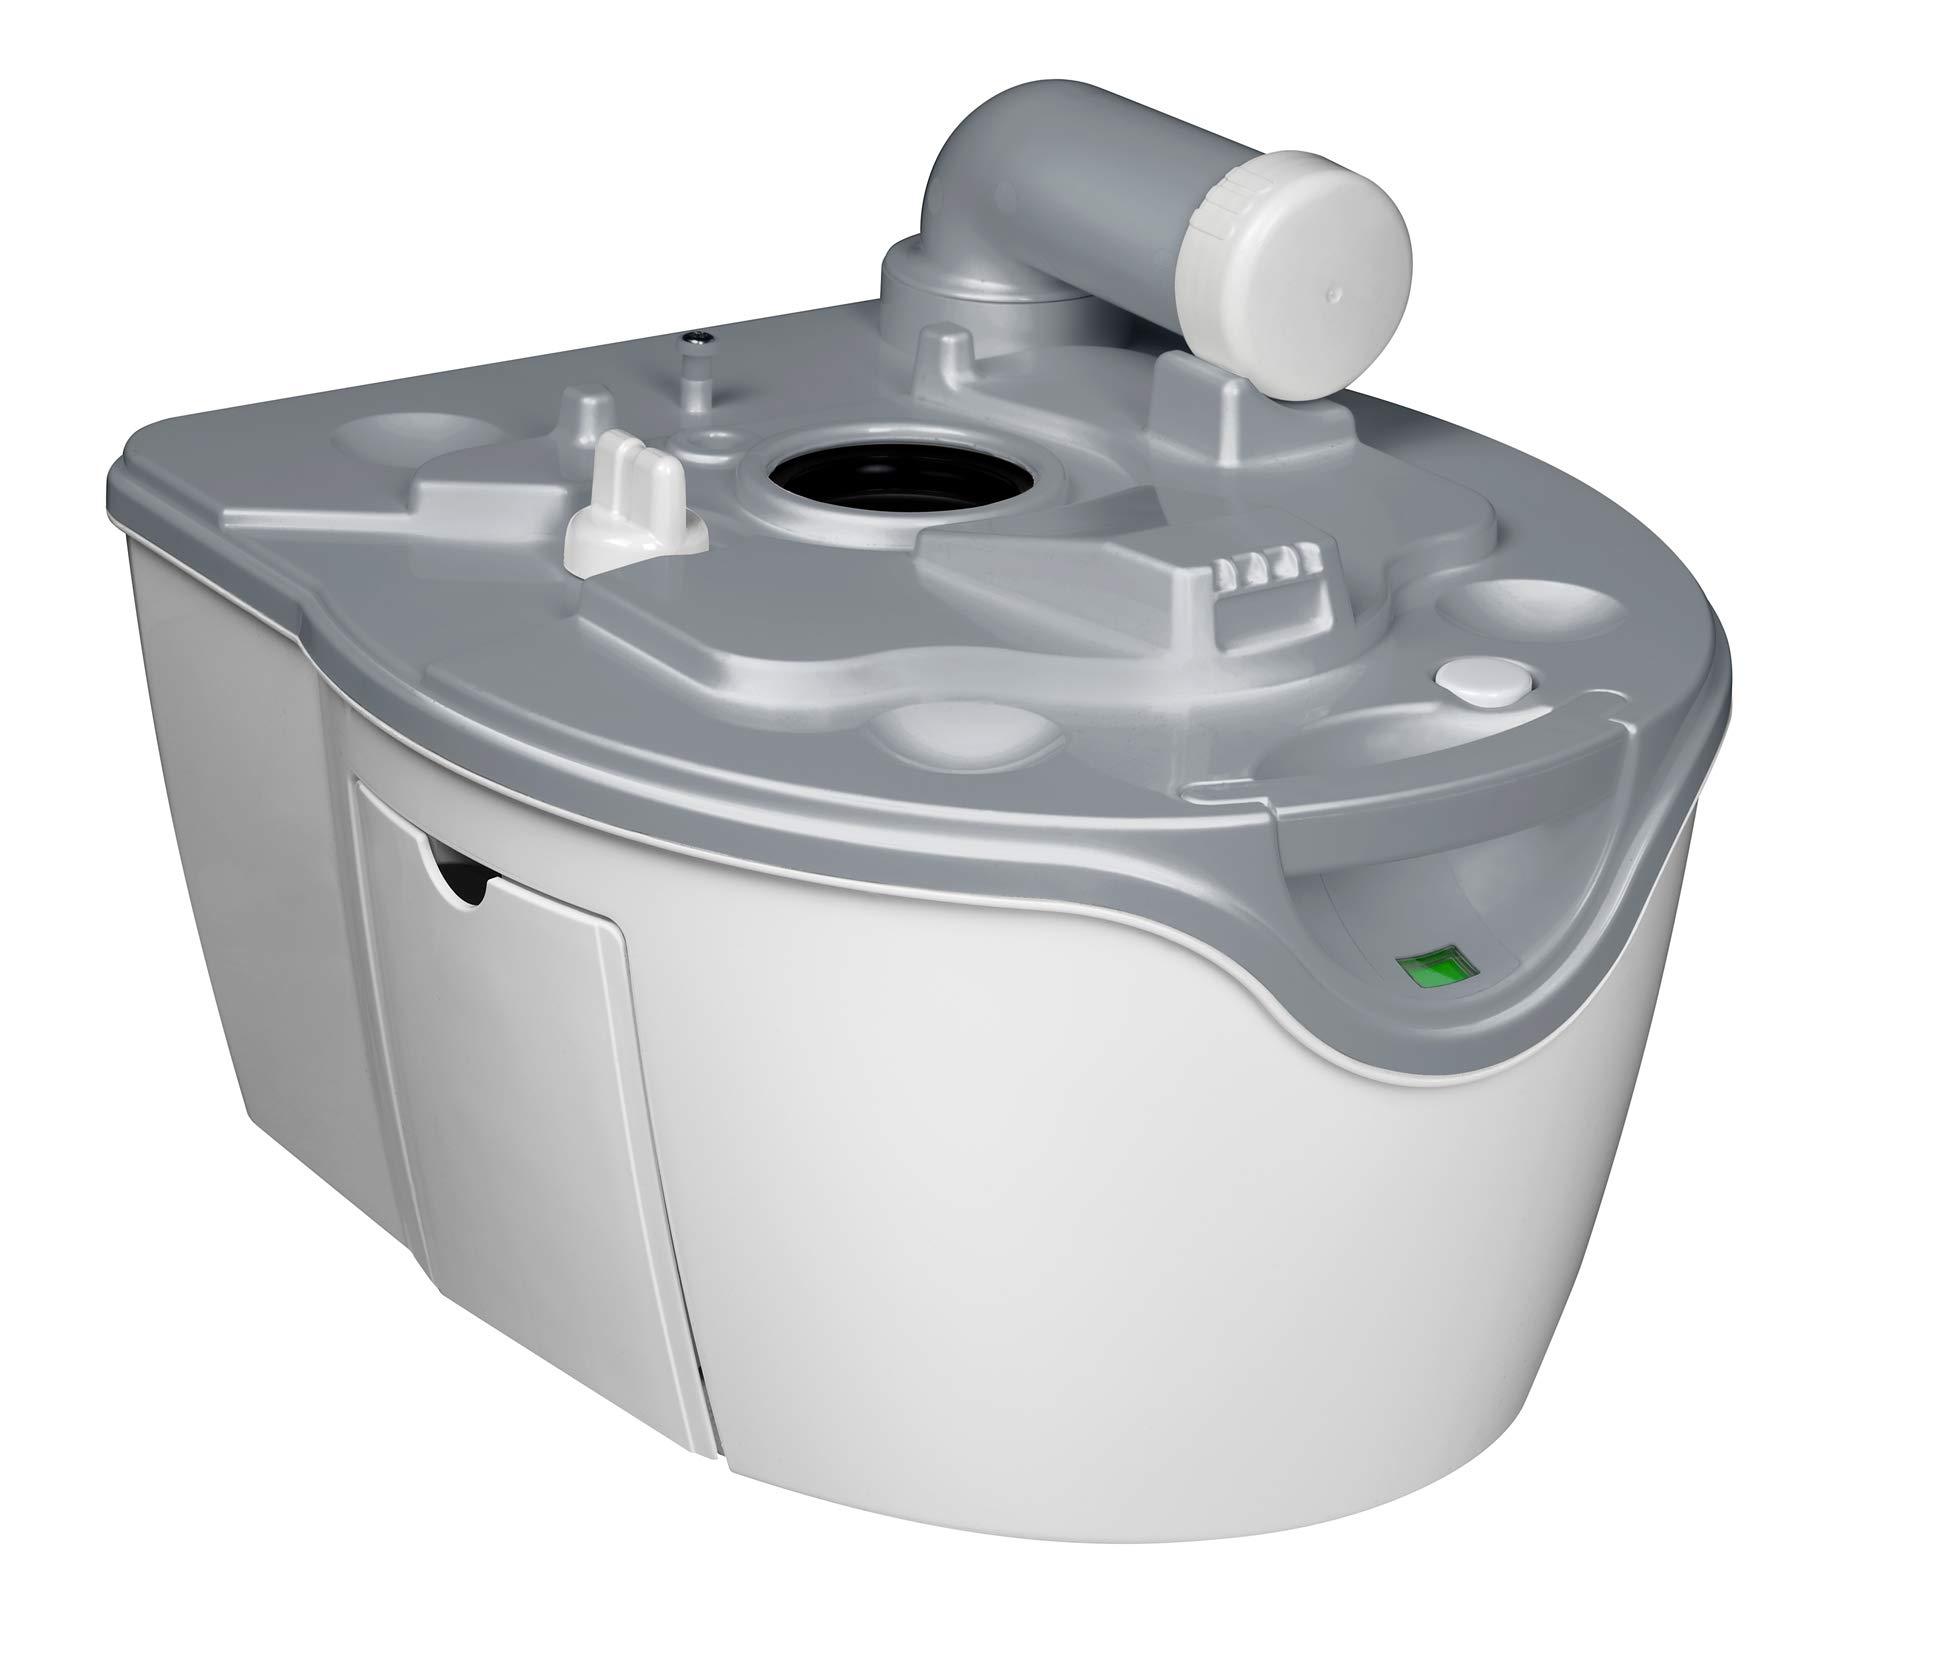 Thetford 92305 Porta Potti 565P Excellence Portable Toilet (Manual), 448 x 388 x 450 mm 8